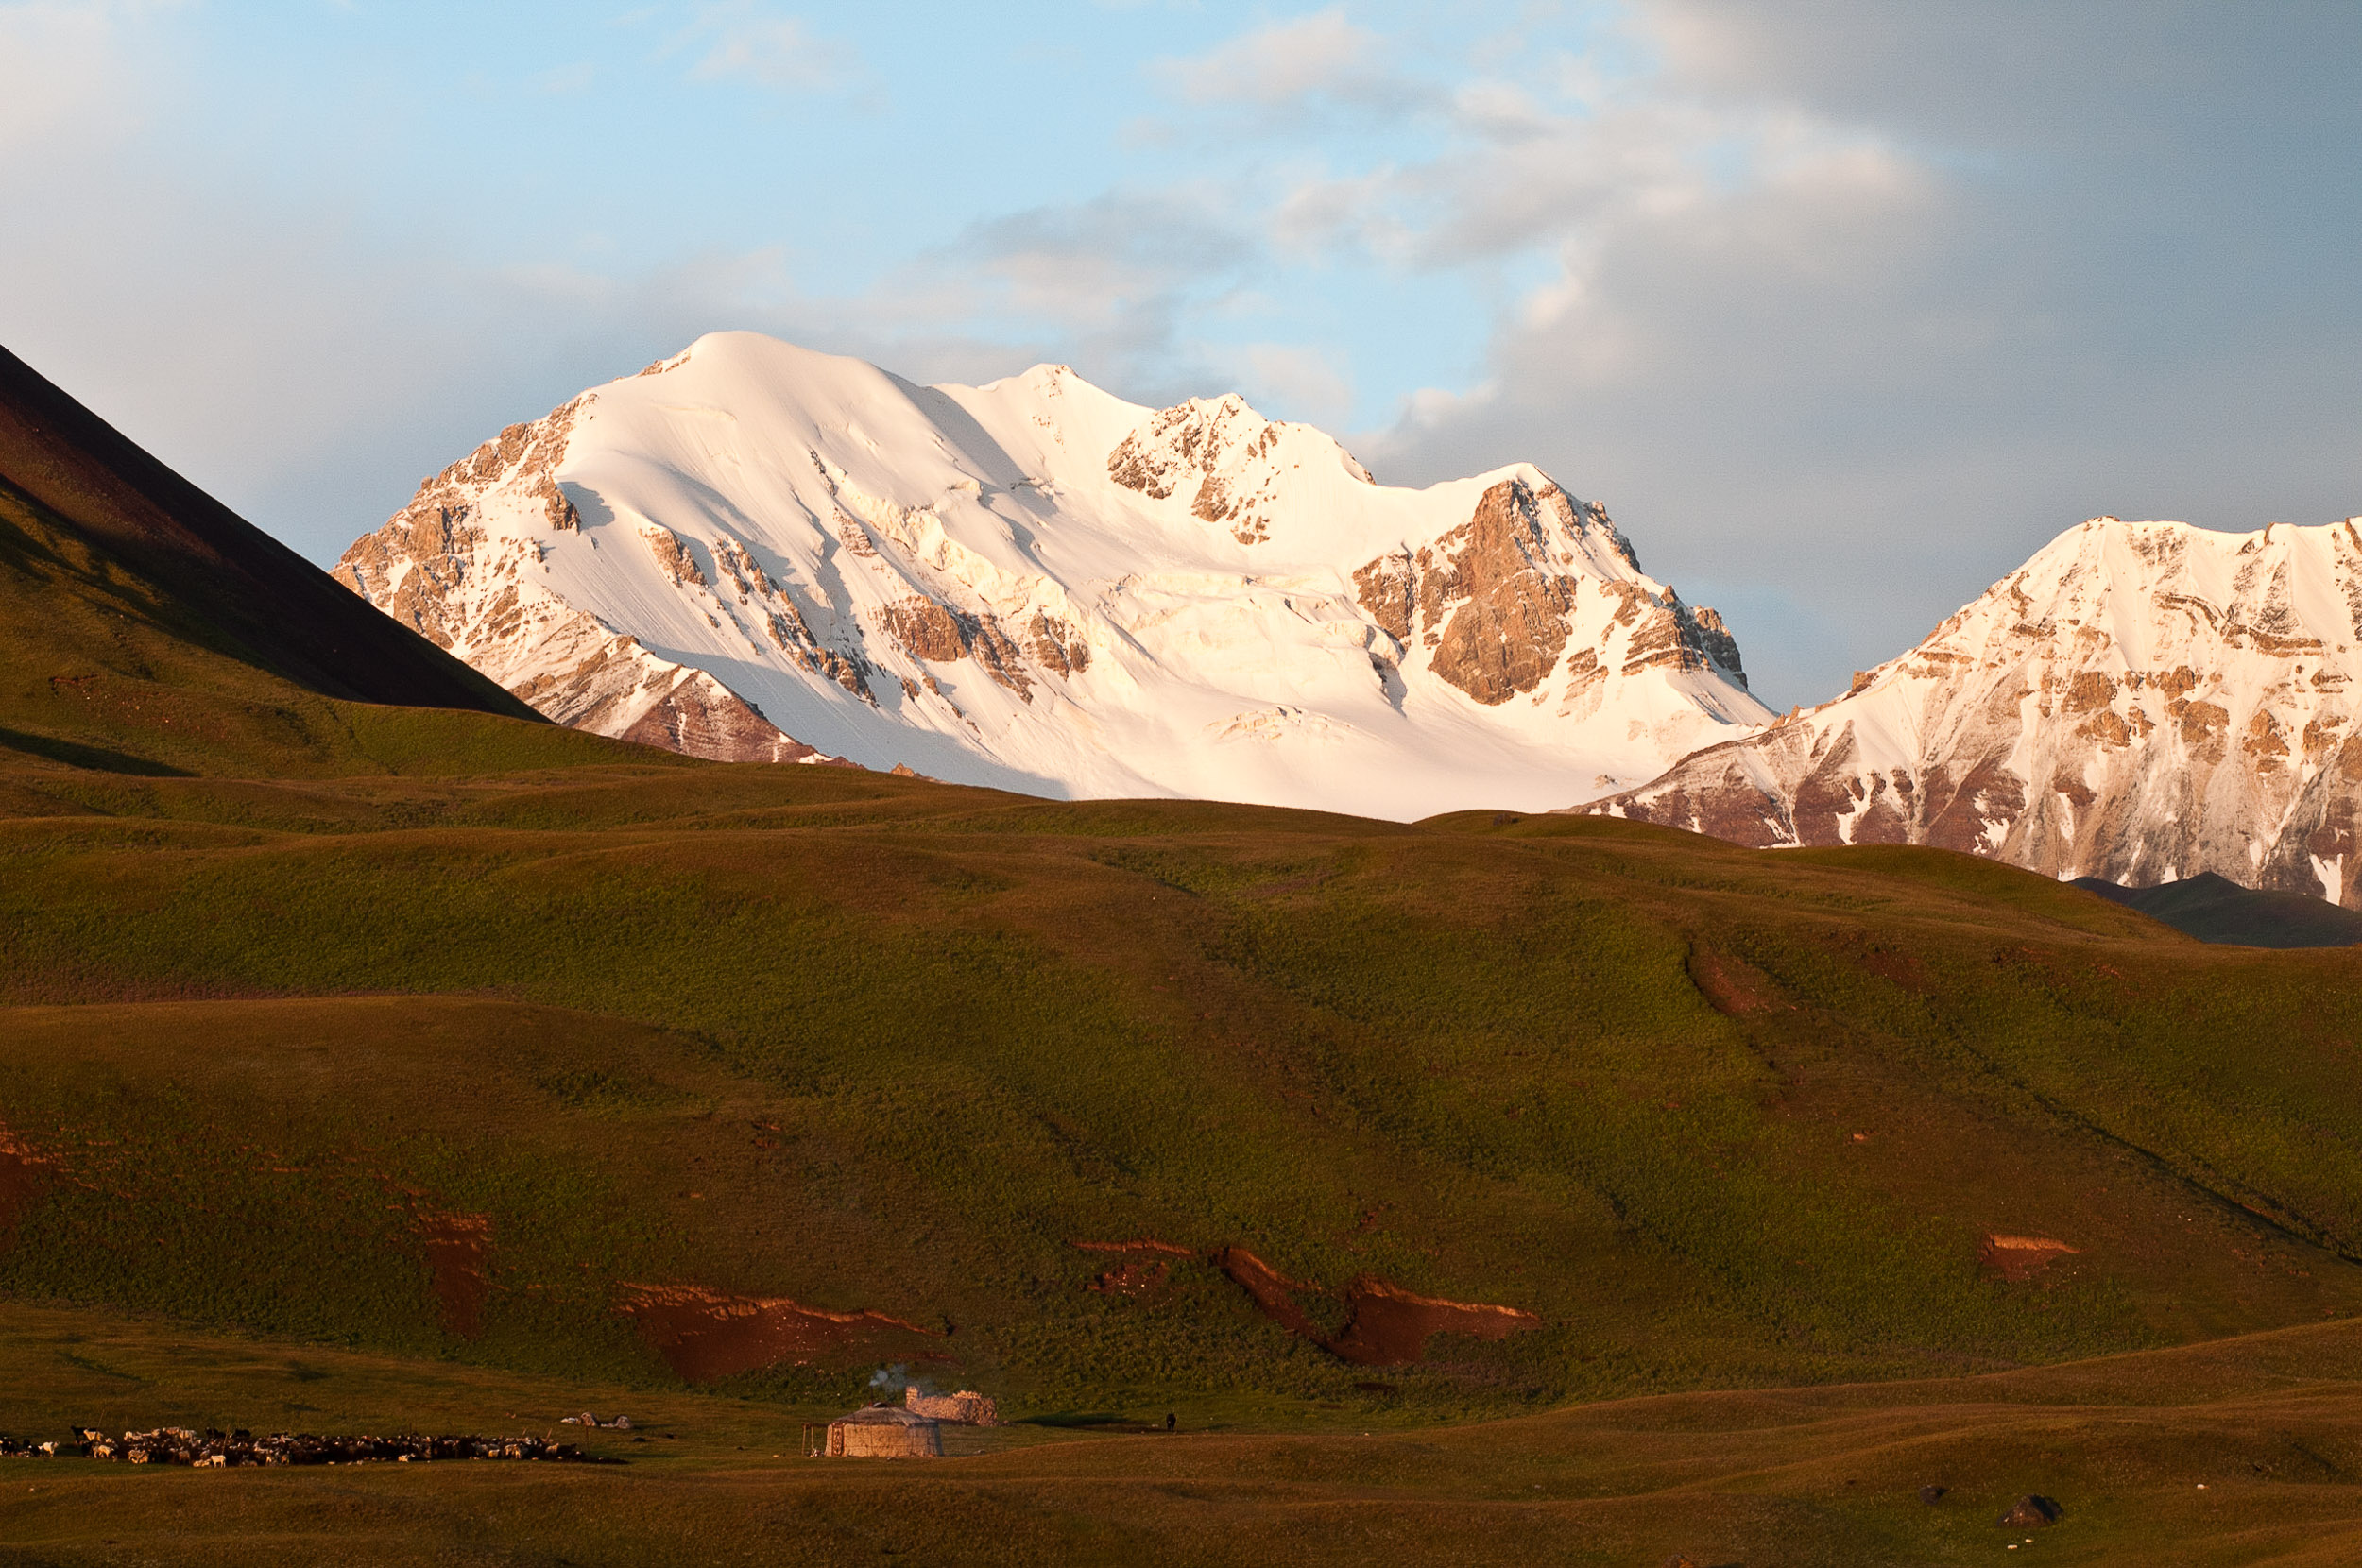 Yurt and mountains, Kyrgyzstan.